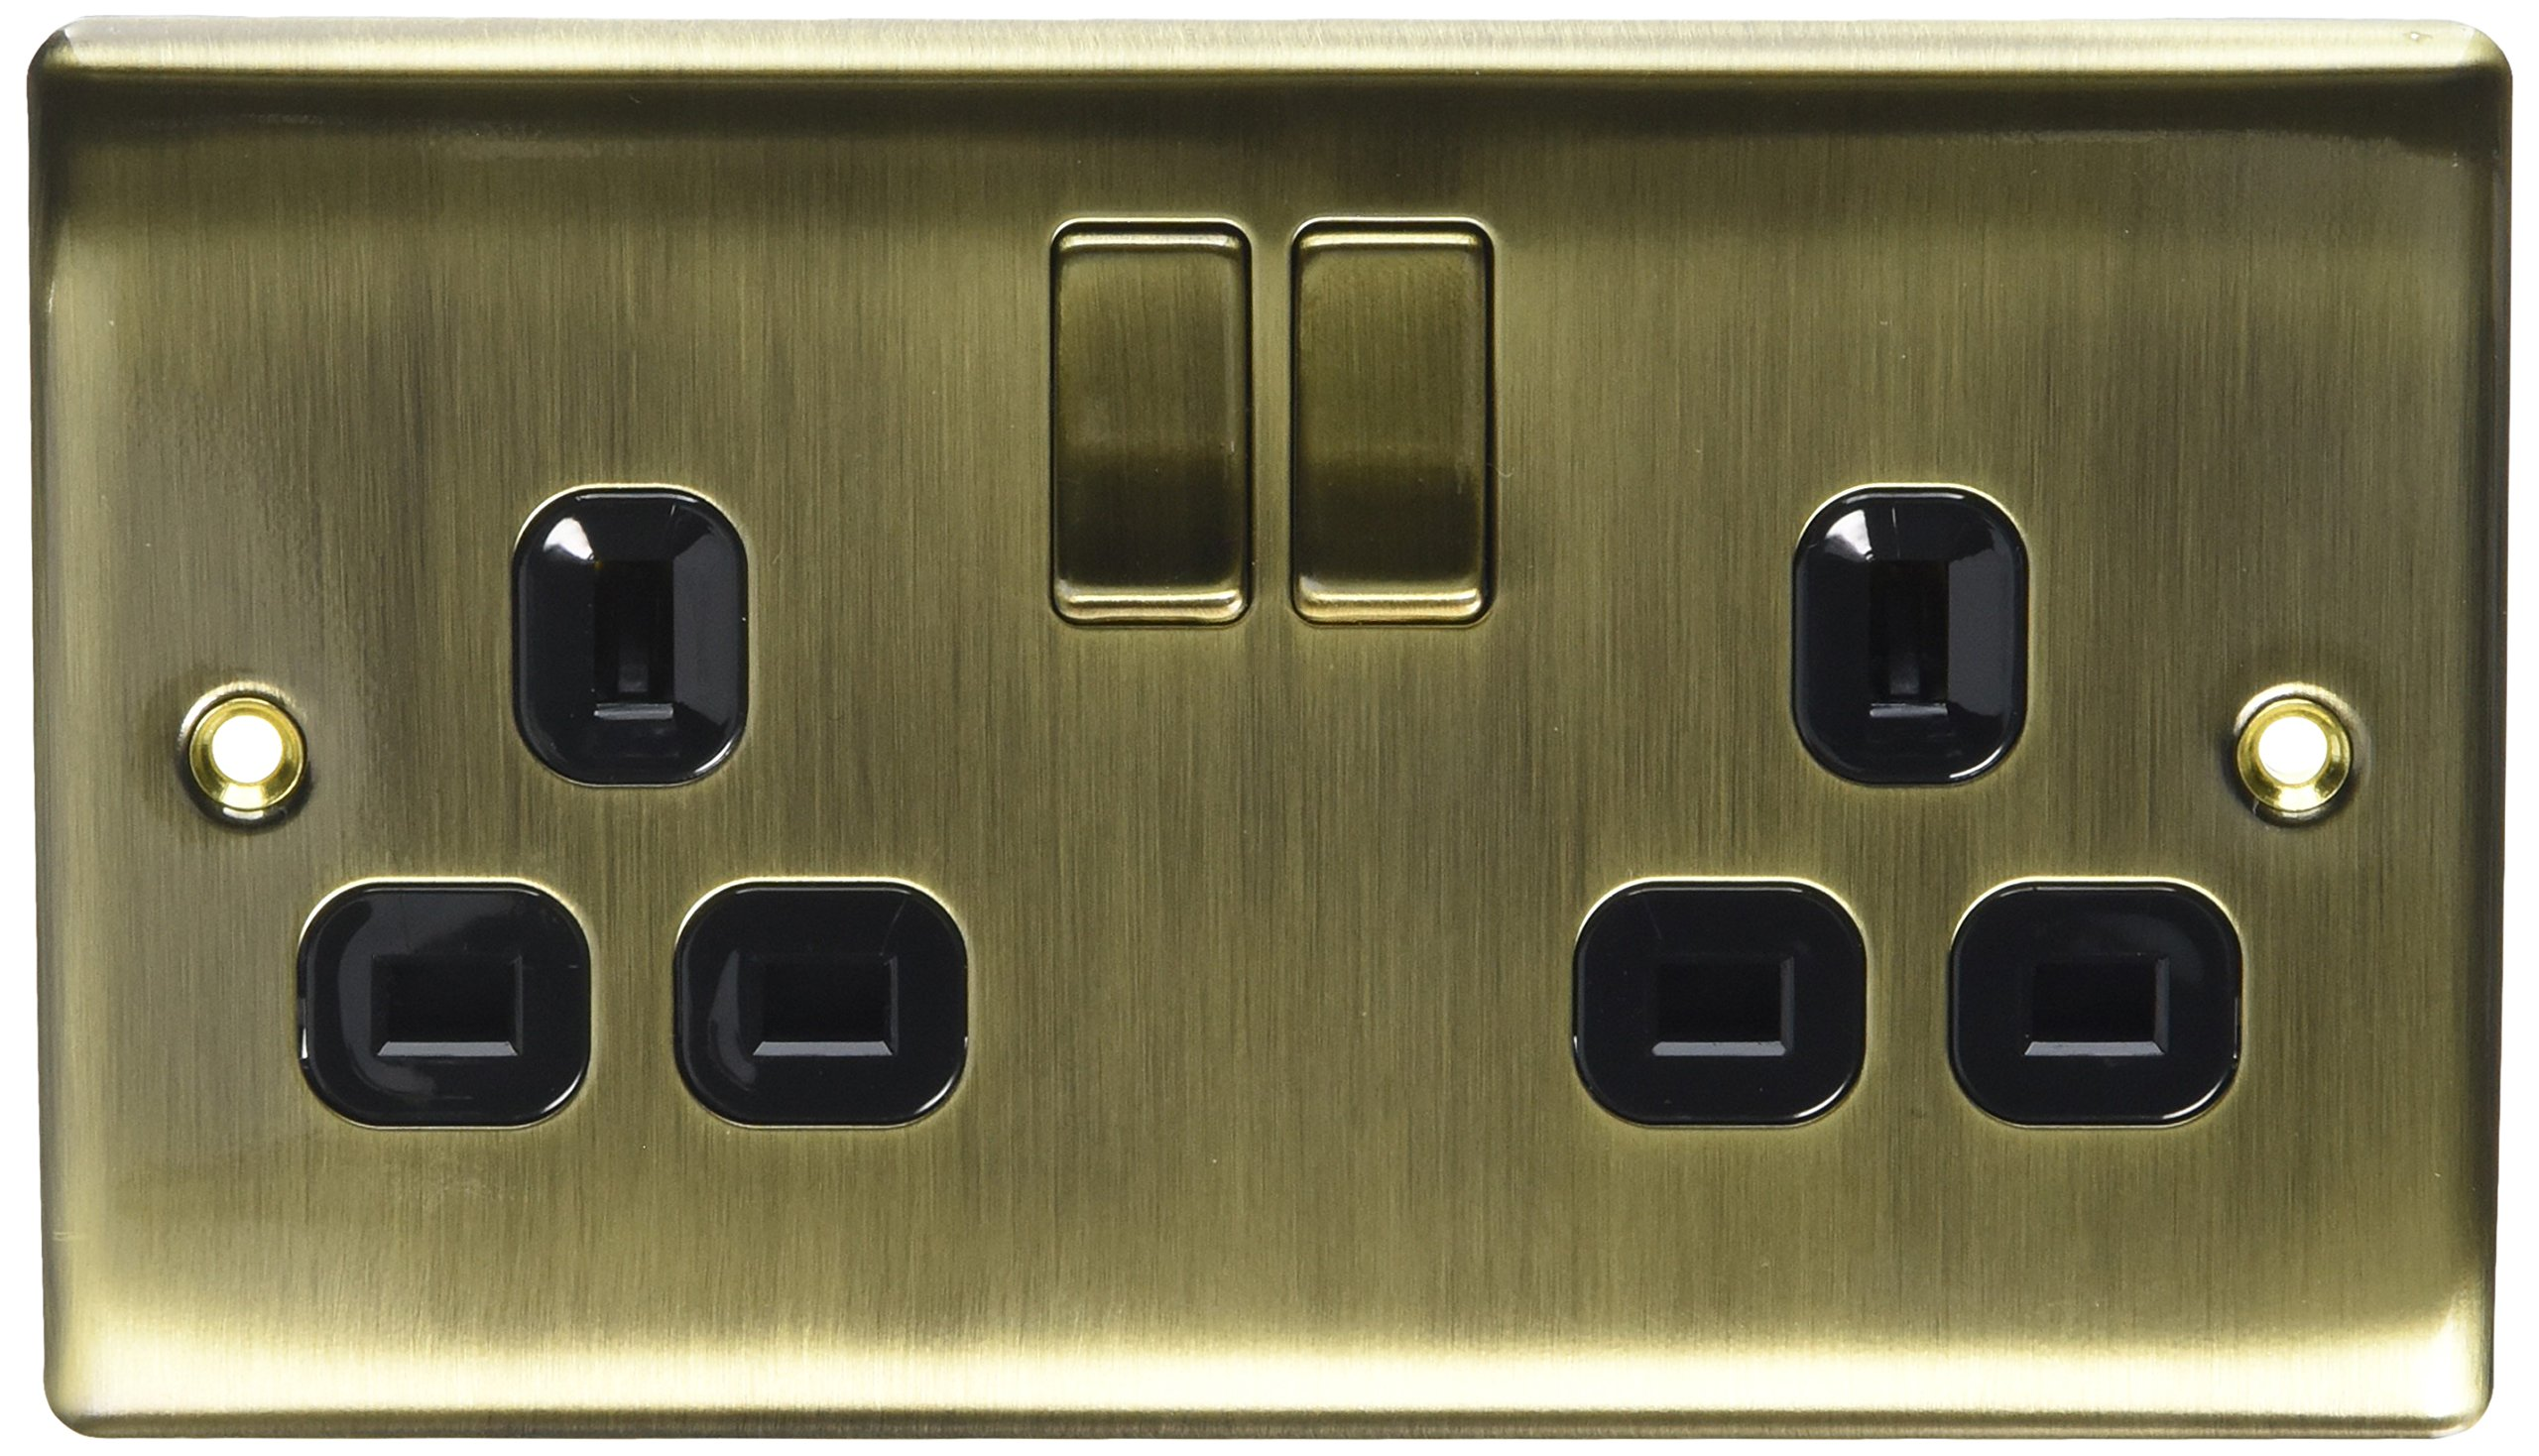 BG Electrical nab22b Metal Antique Brass Double Plug Socket Switch - Antique Brass Black